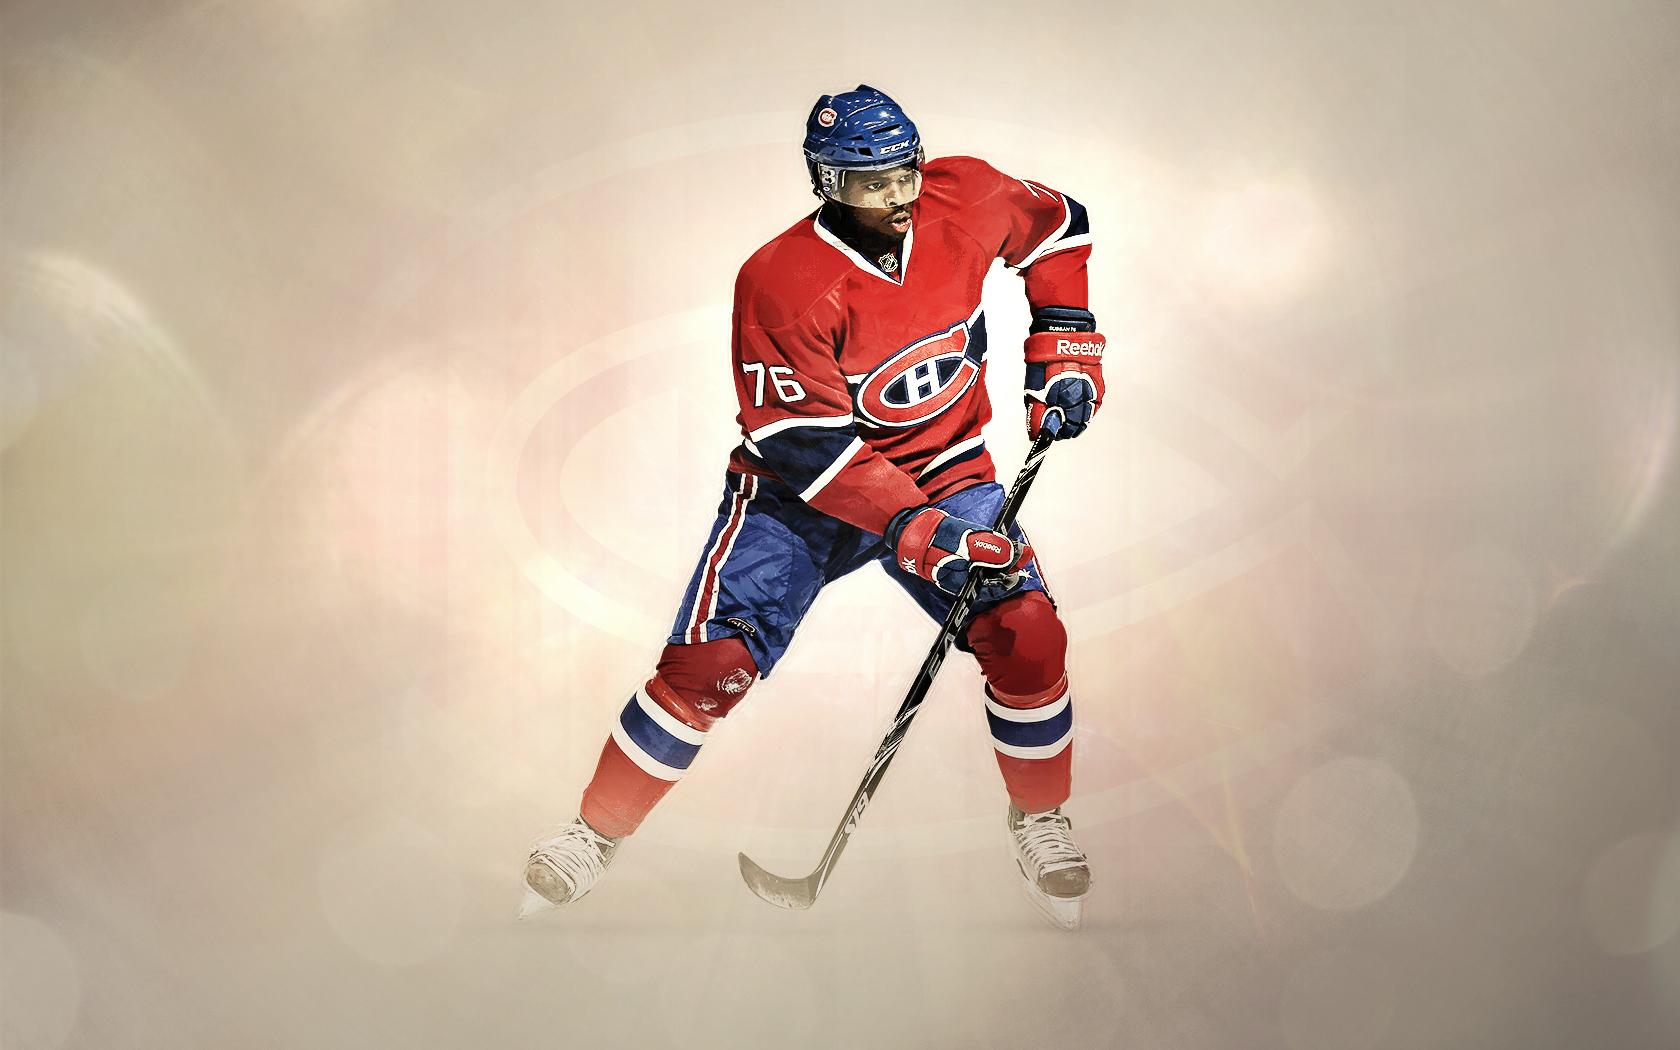 PK Subban Wallpaper Montreal Hockey Canadiens 8 HD 1680x1050